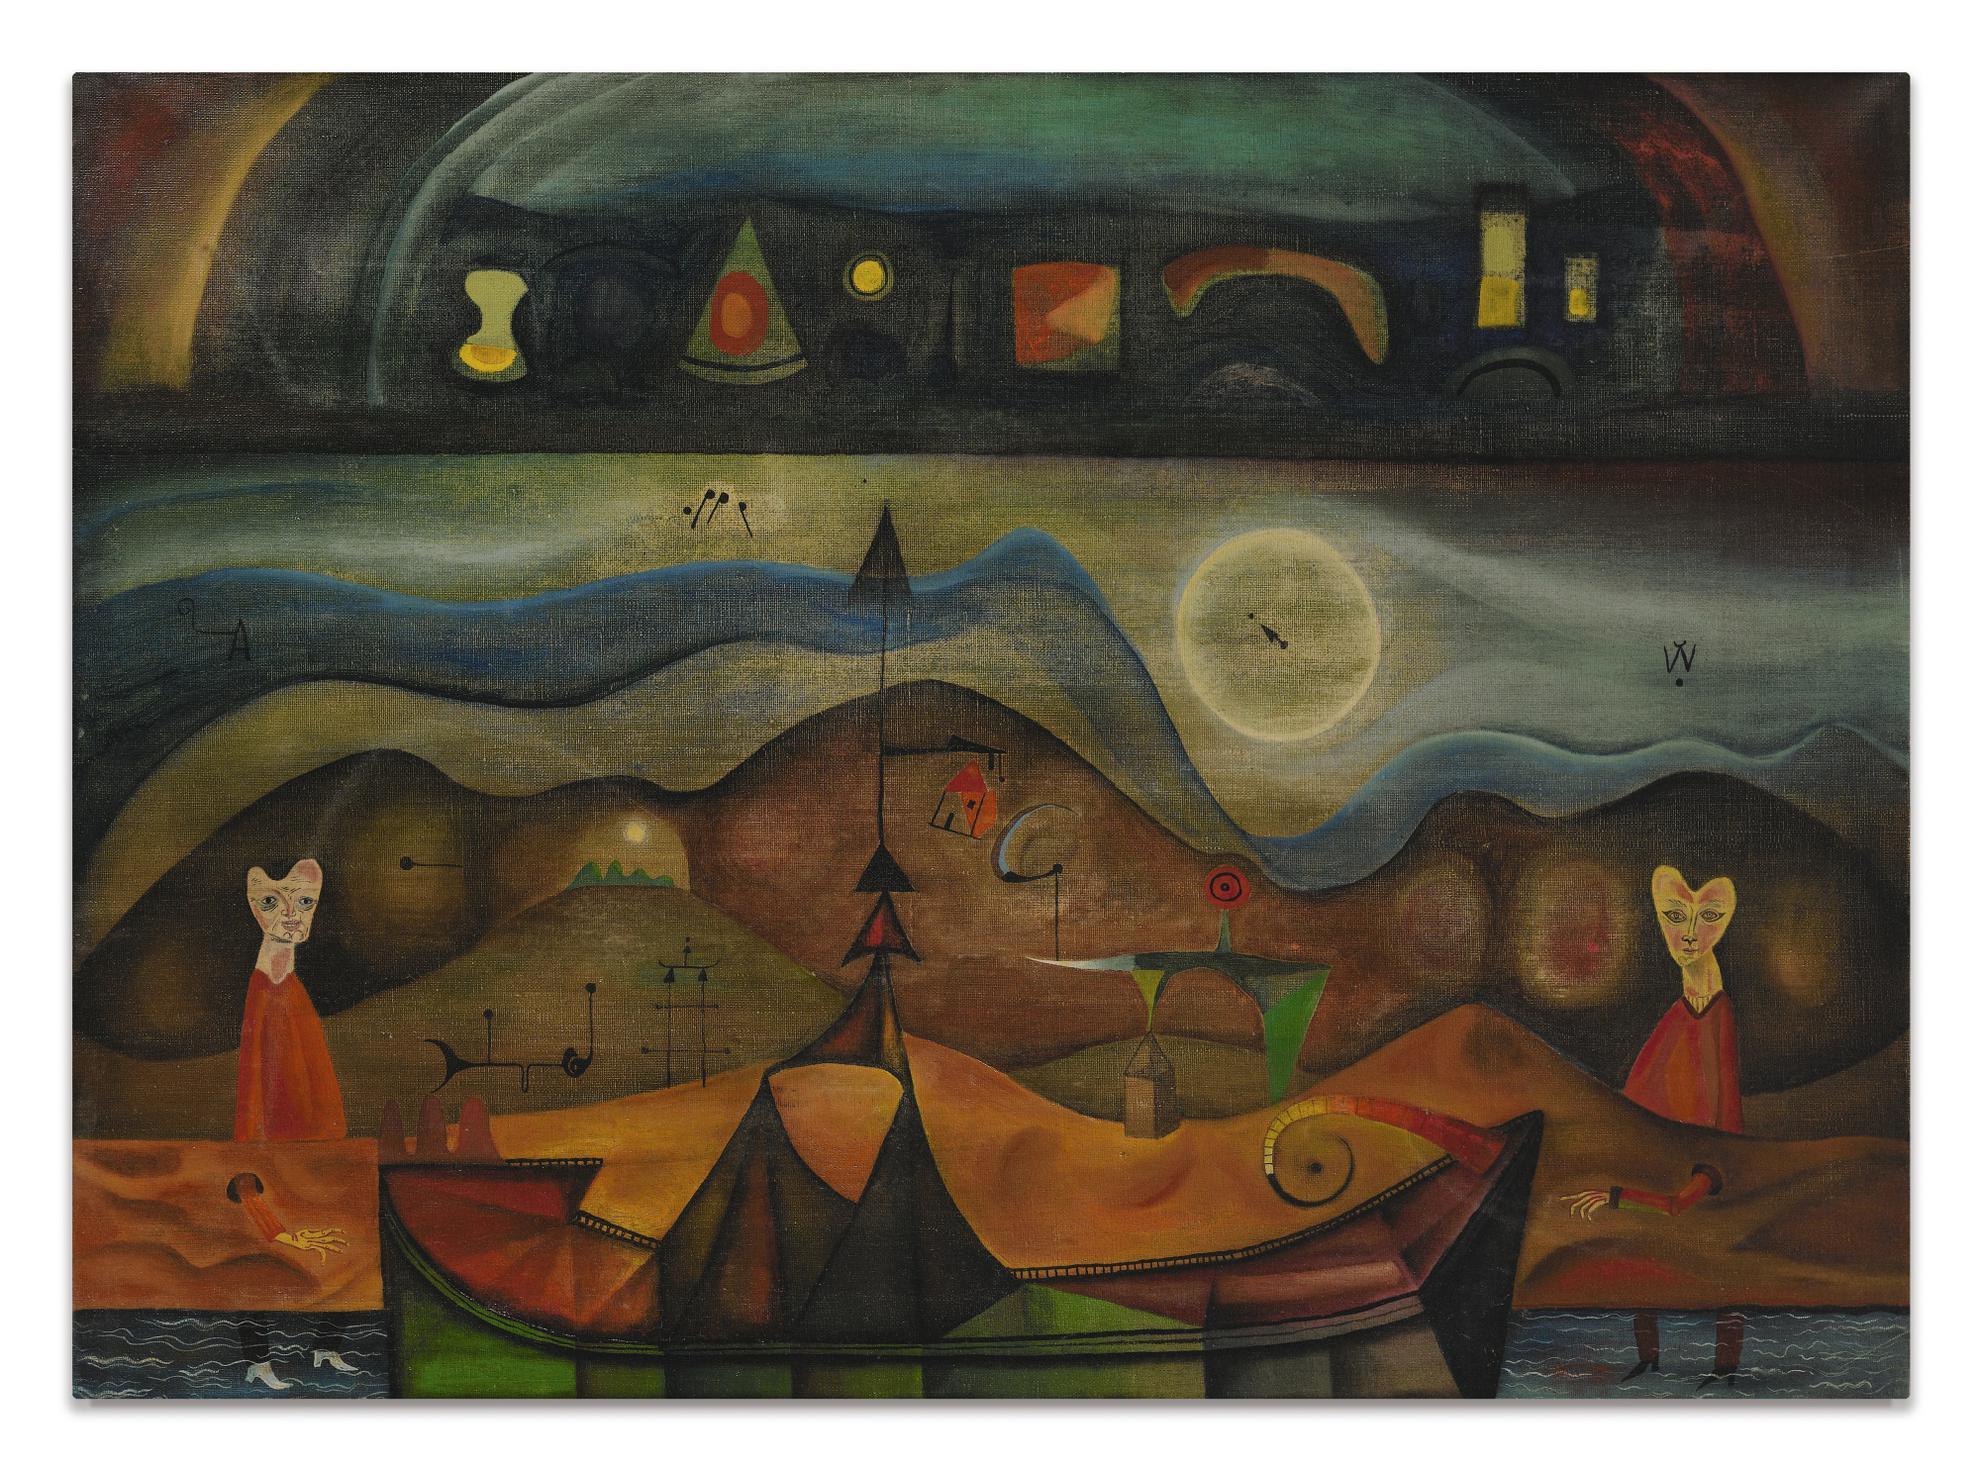 Modest Cuixart-Brufungles-1949